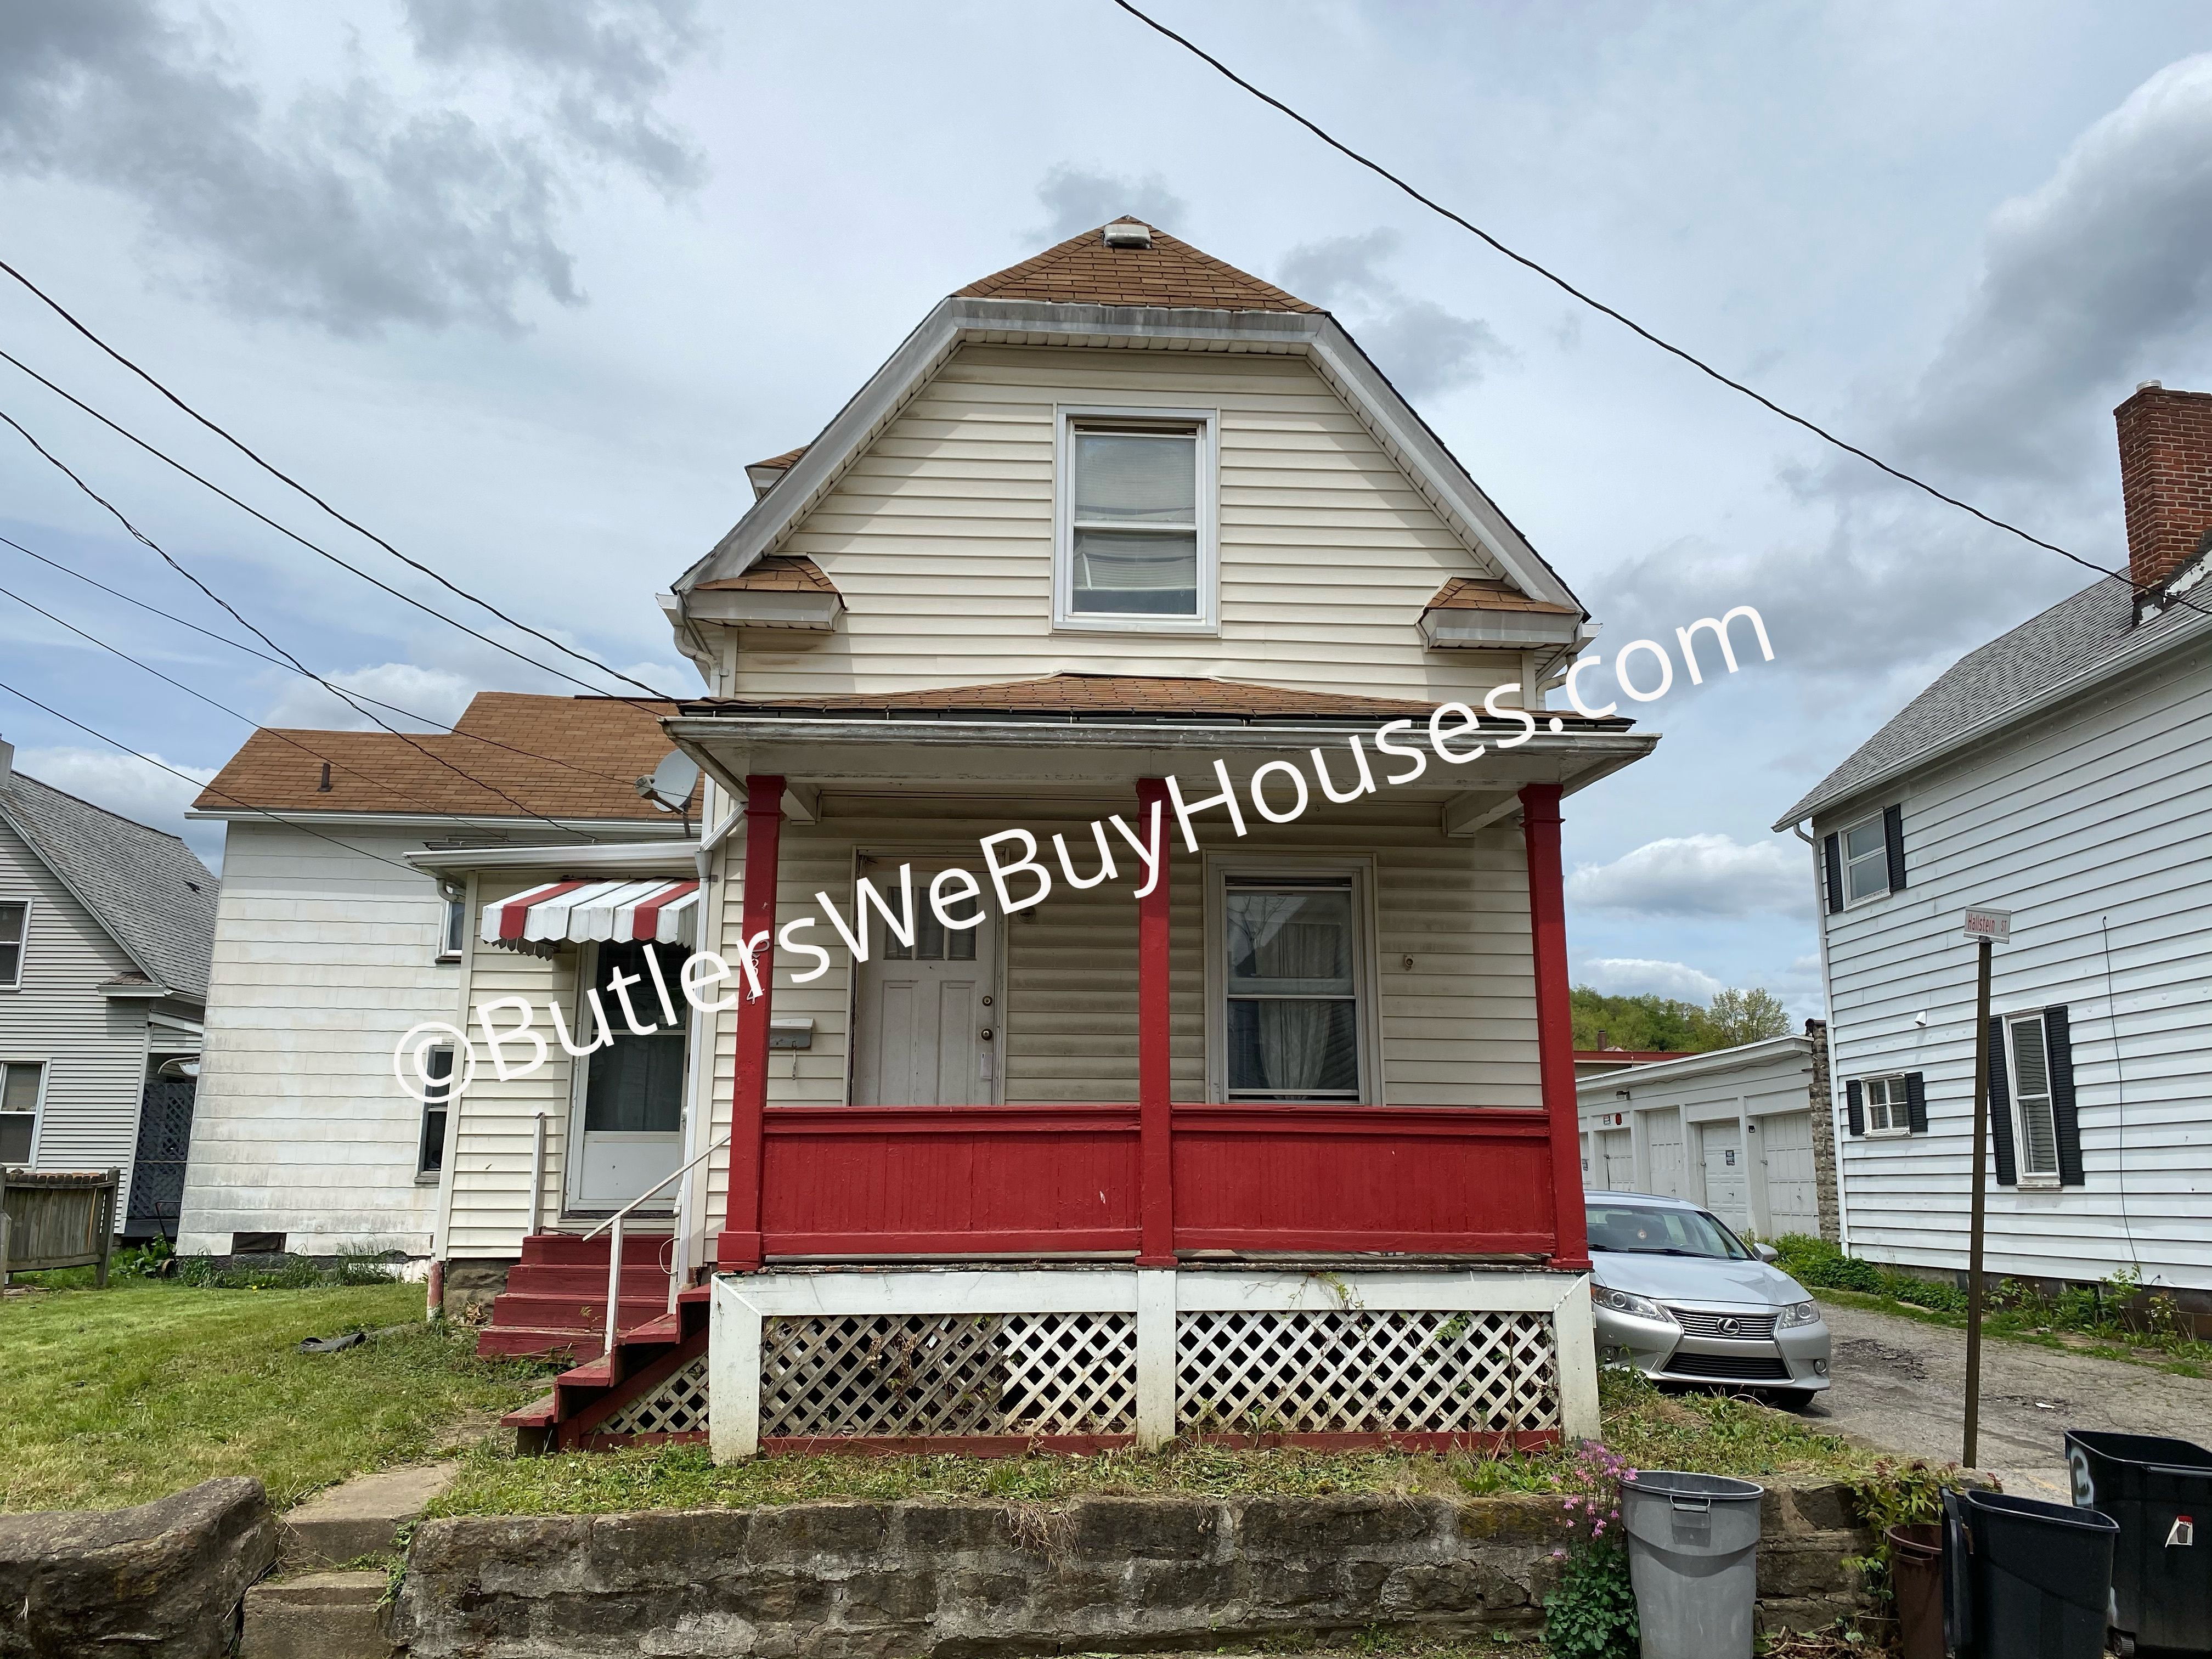 234 Amy Ave (Image - 1)